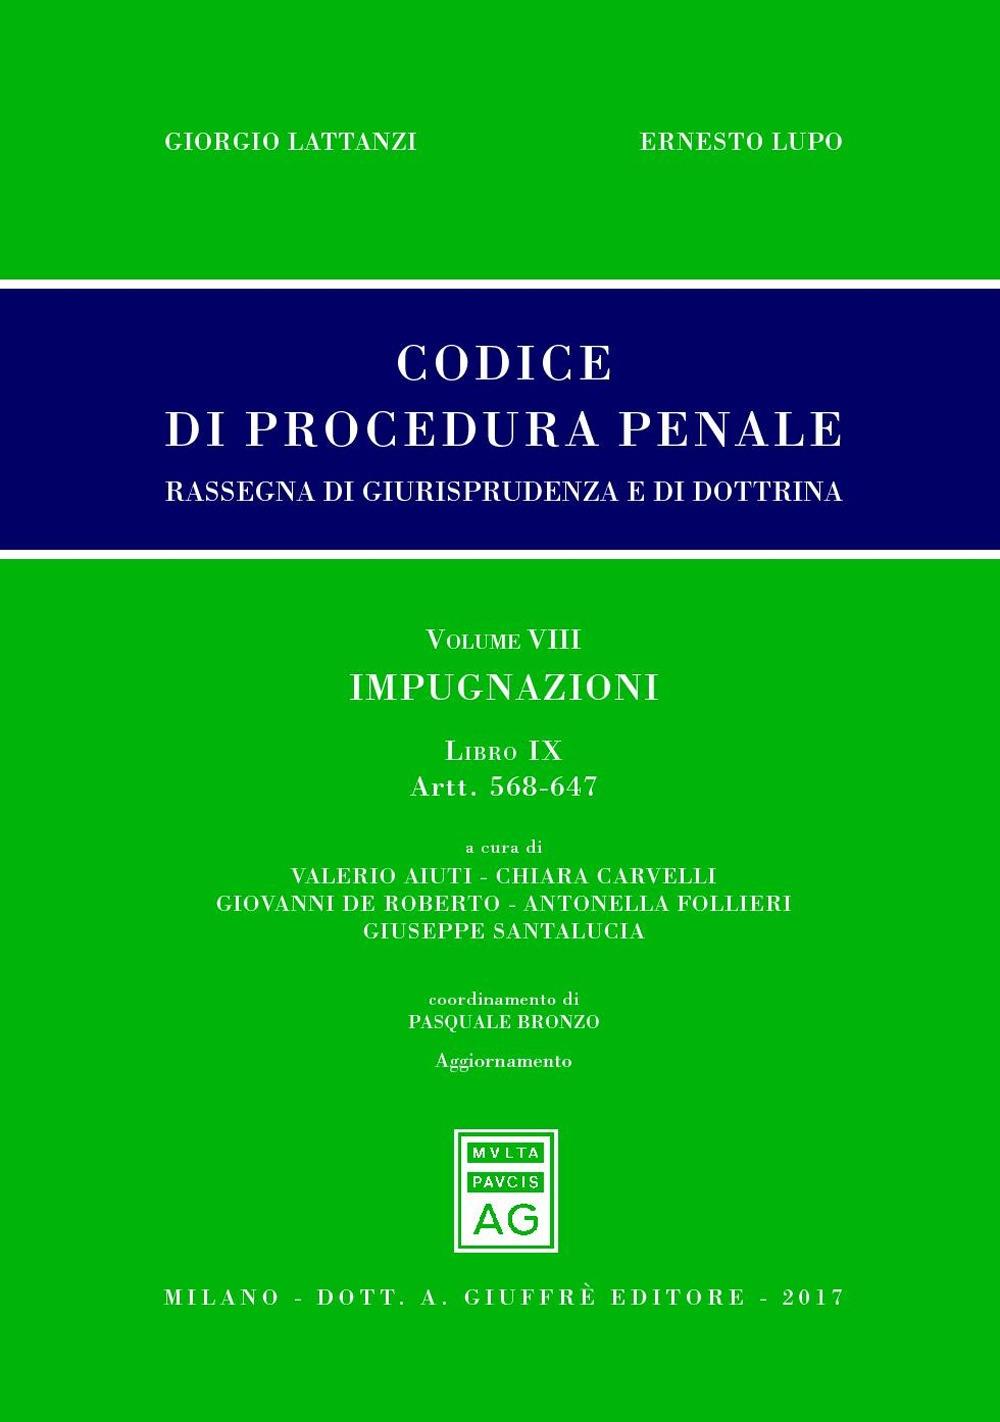 Codice di procedura penale. Rassegna di giurisprudenza e di dottrina. Vol. 8: artt. 568-647. Impugnazioni